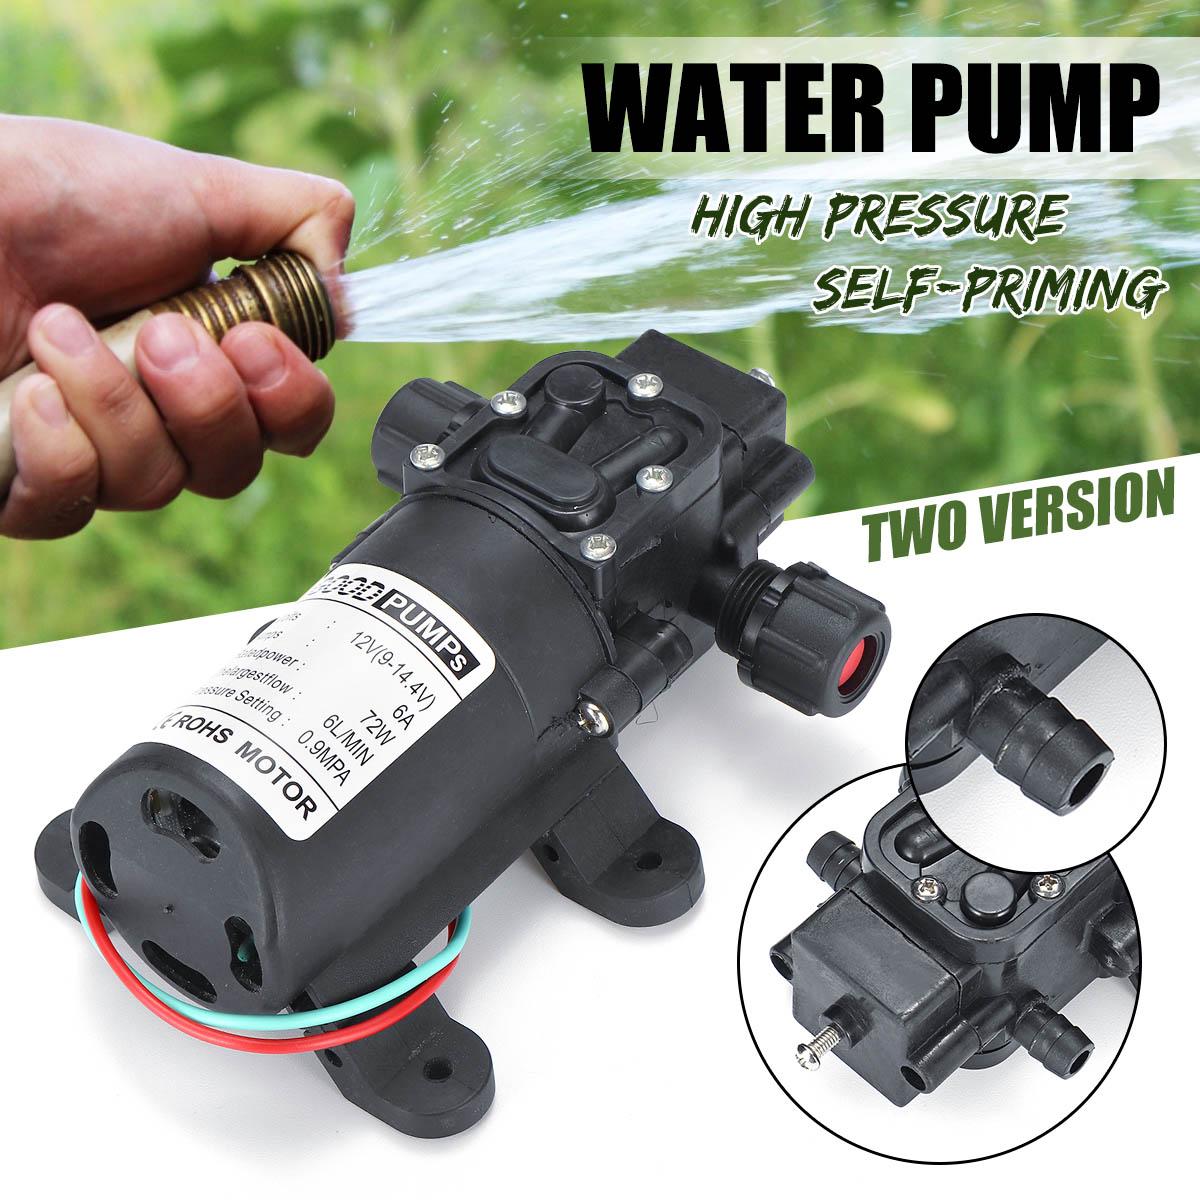 12V 6 Lpm Self-Priming Water Pump High Pressure Caravan Camping Boat Car  Washer Pump Garden Agricultural Irrigation Sprayer Pump